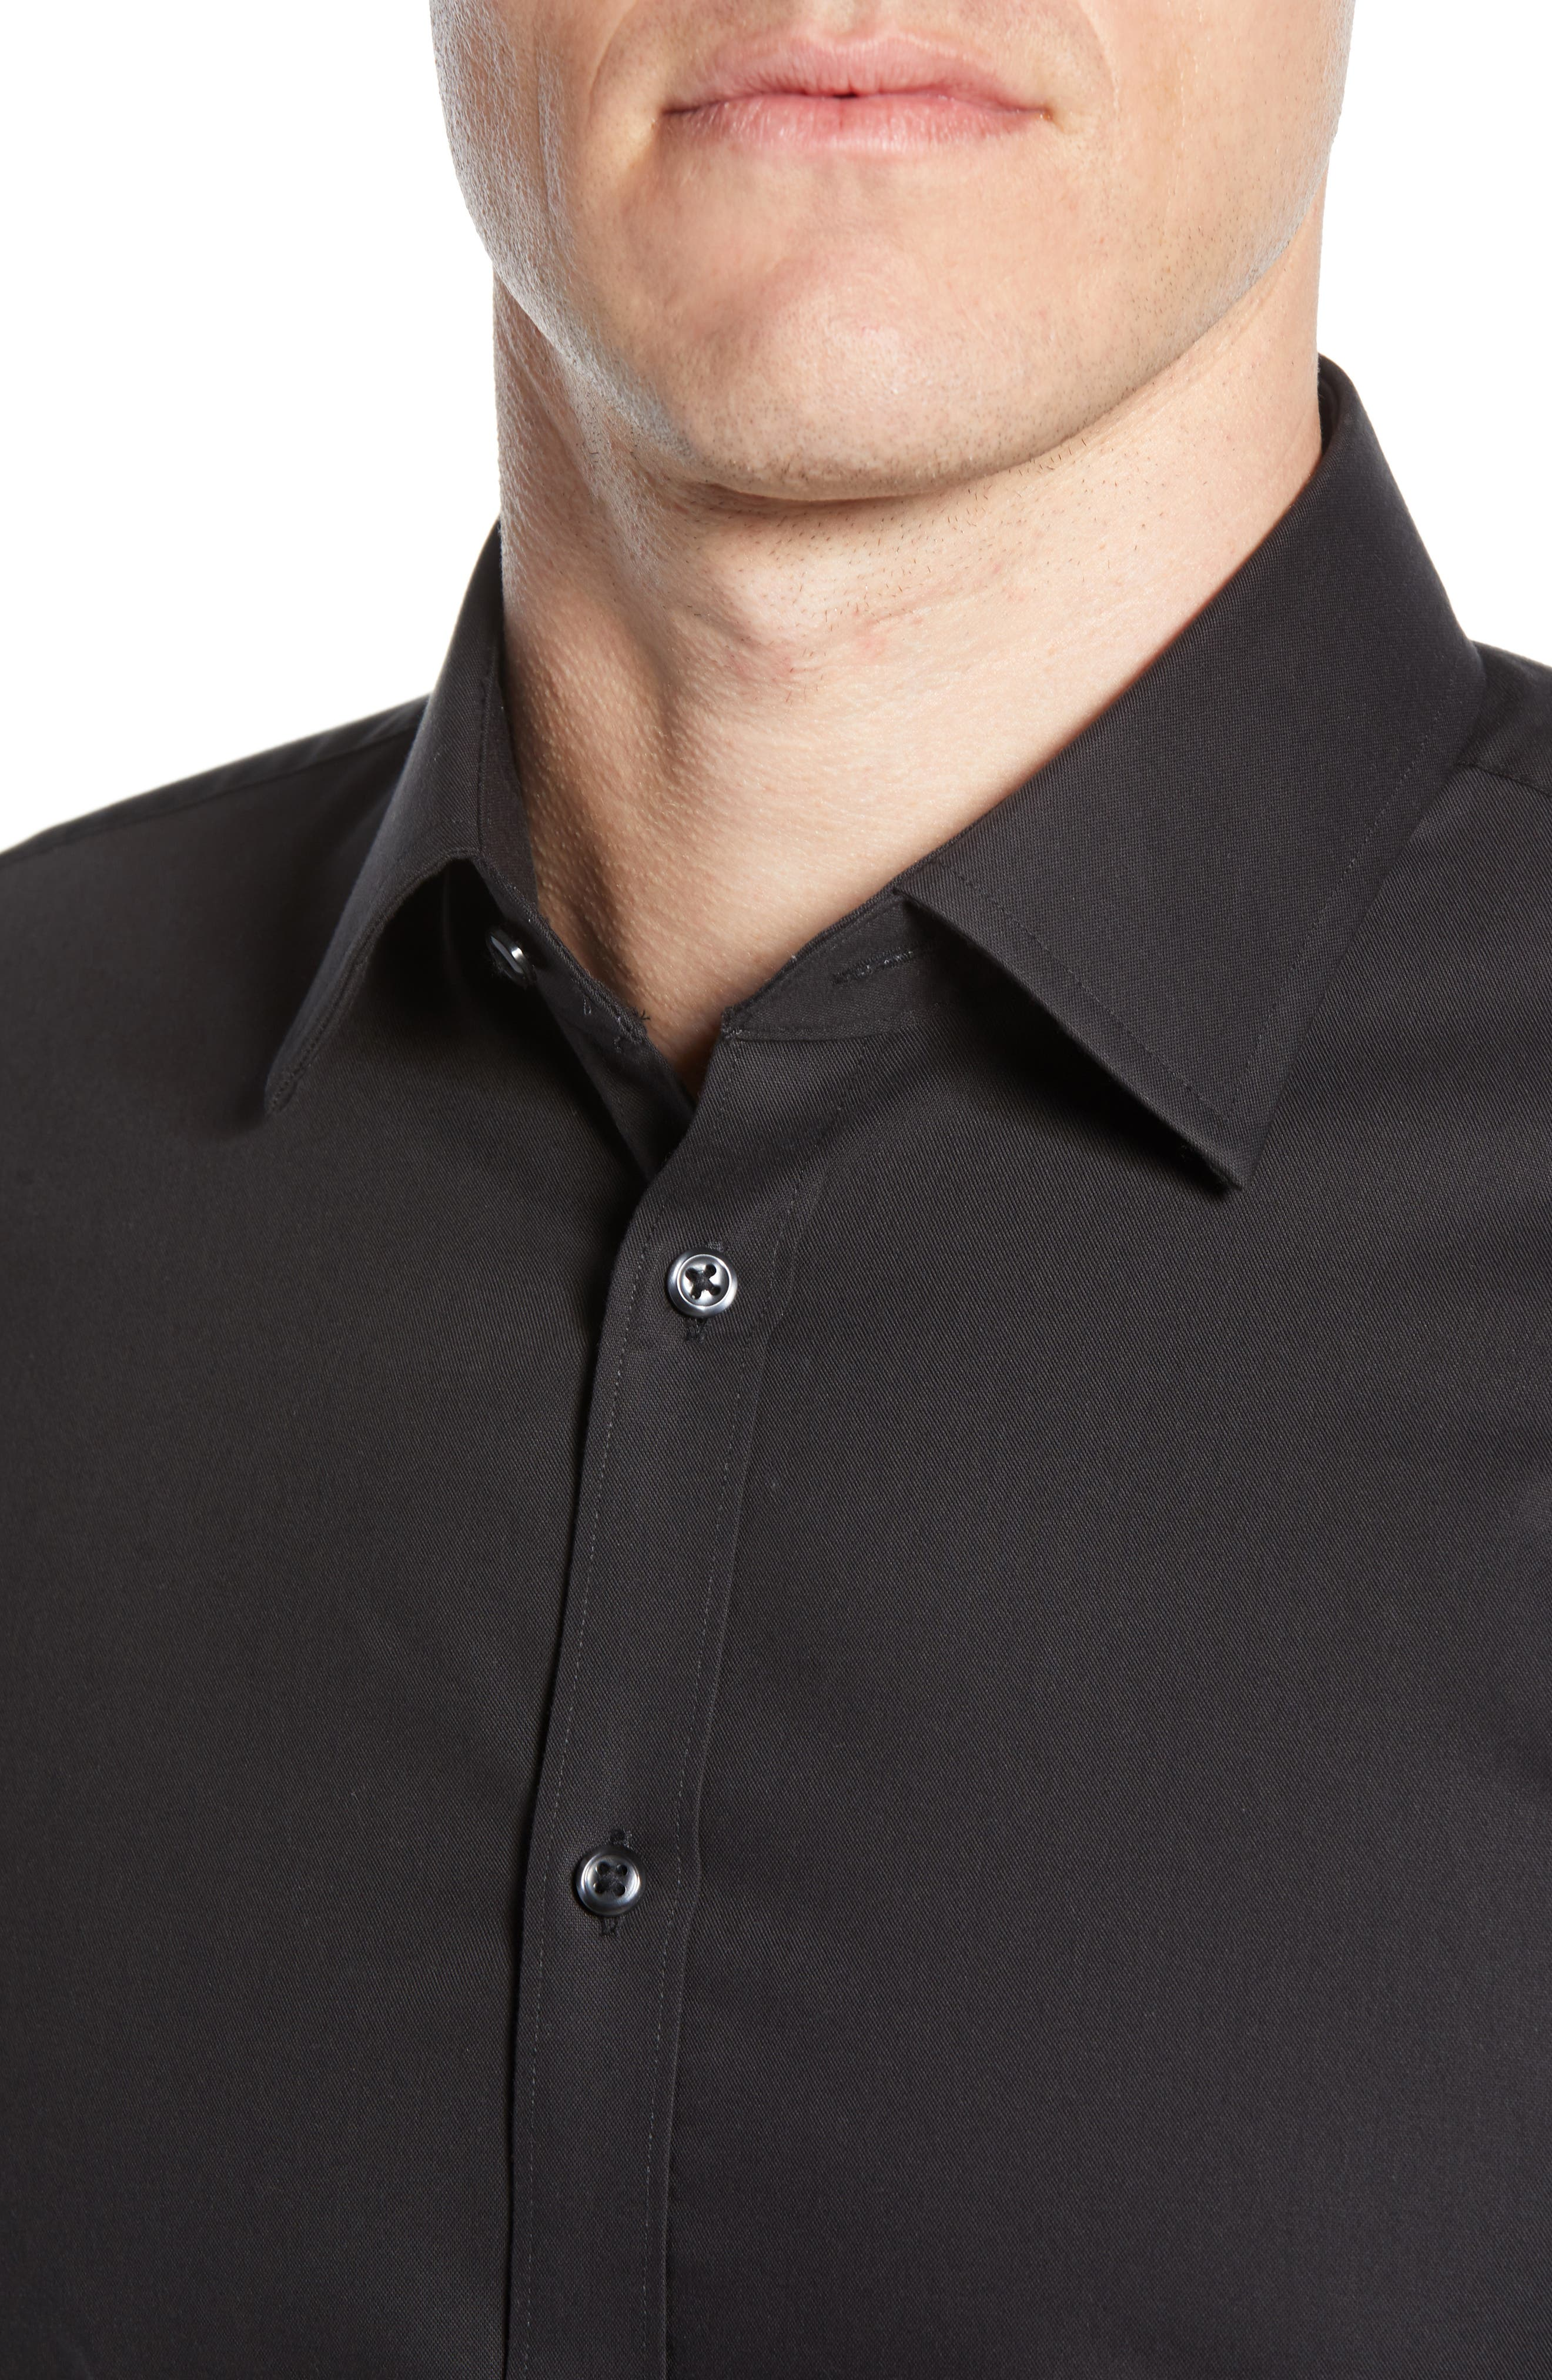 NORDSTROM MEN'S SHOP,                             Extra Trim Fit Non-Iron Solid Dress Shirt,                             Alternate thumbnail 2, color,                             BLACK ROCK